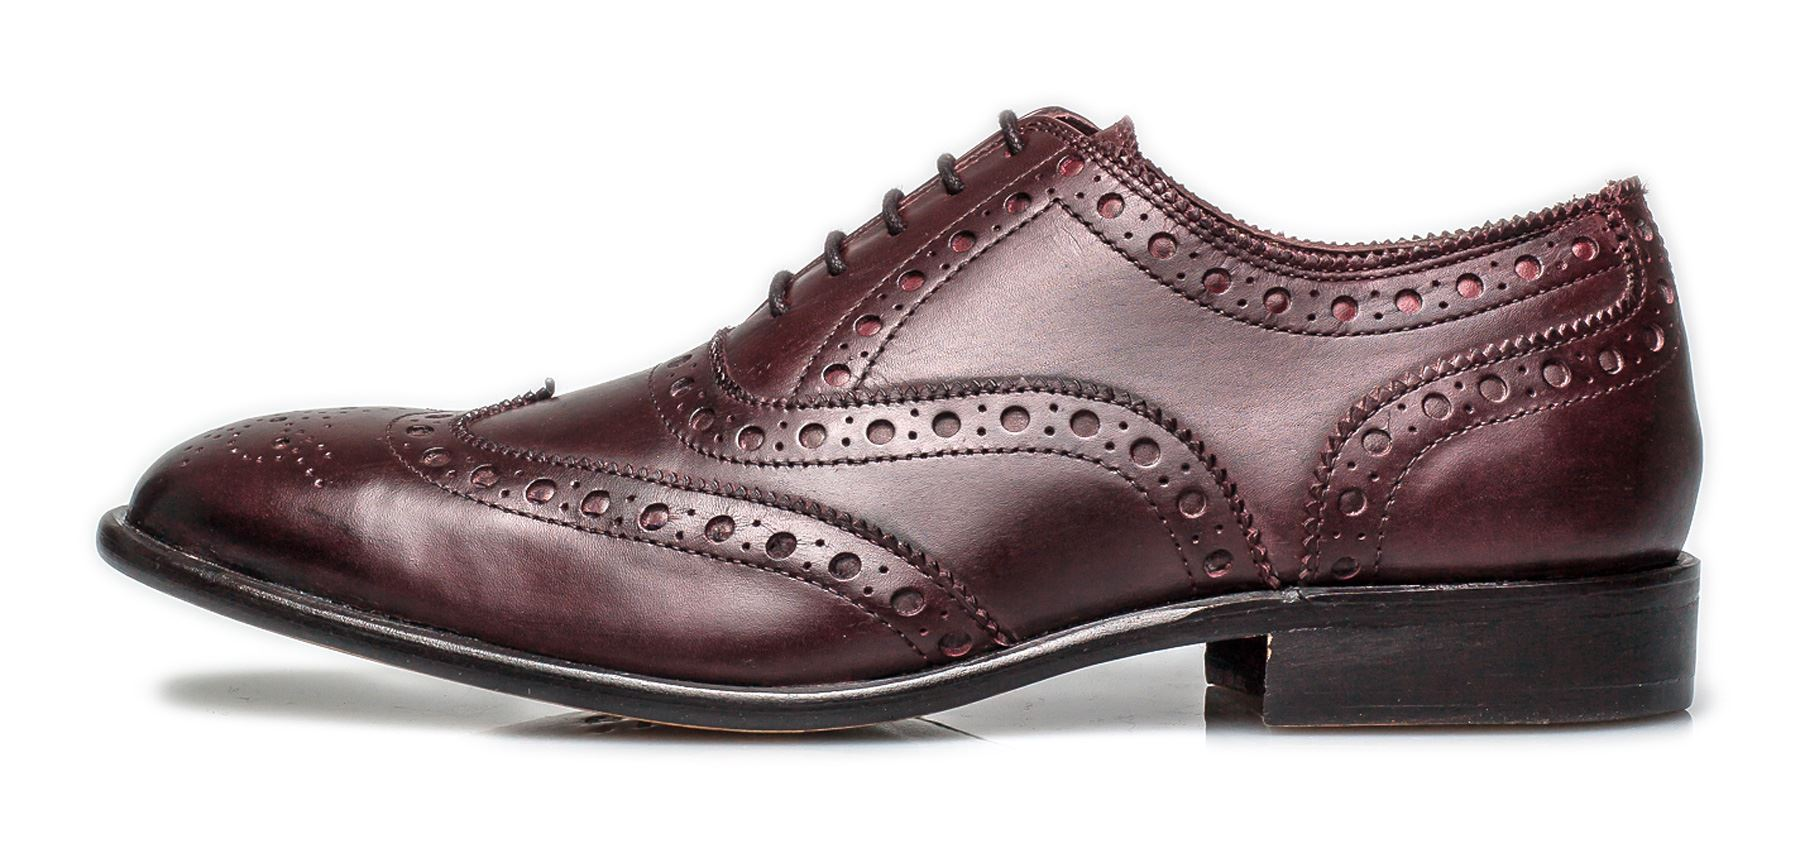 London Brogues Mens Leather Sole Bucanon Brogue Oxford Shoes